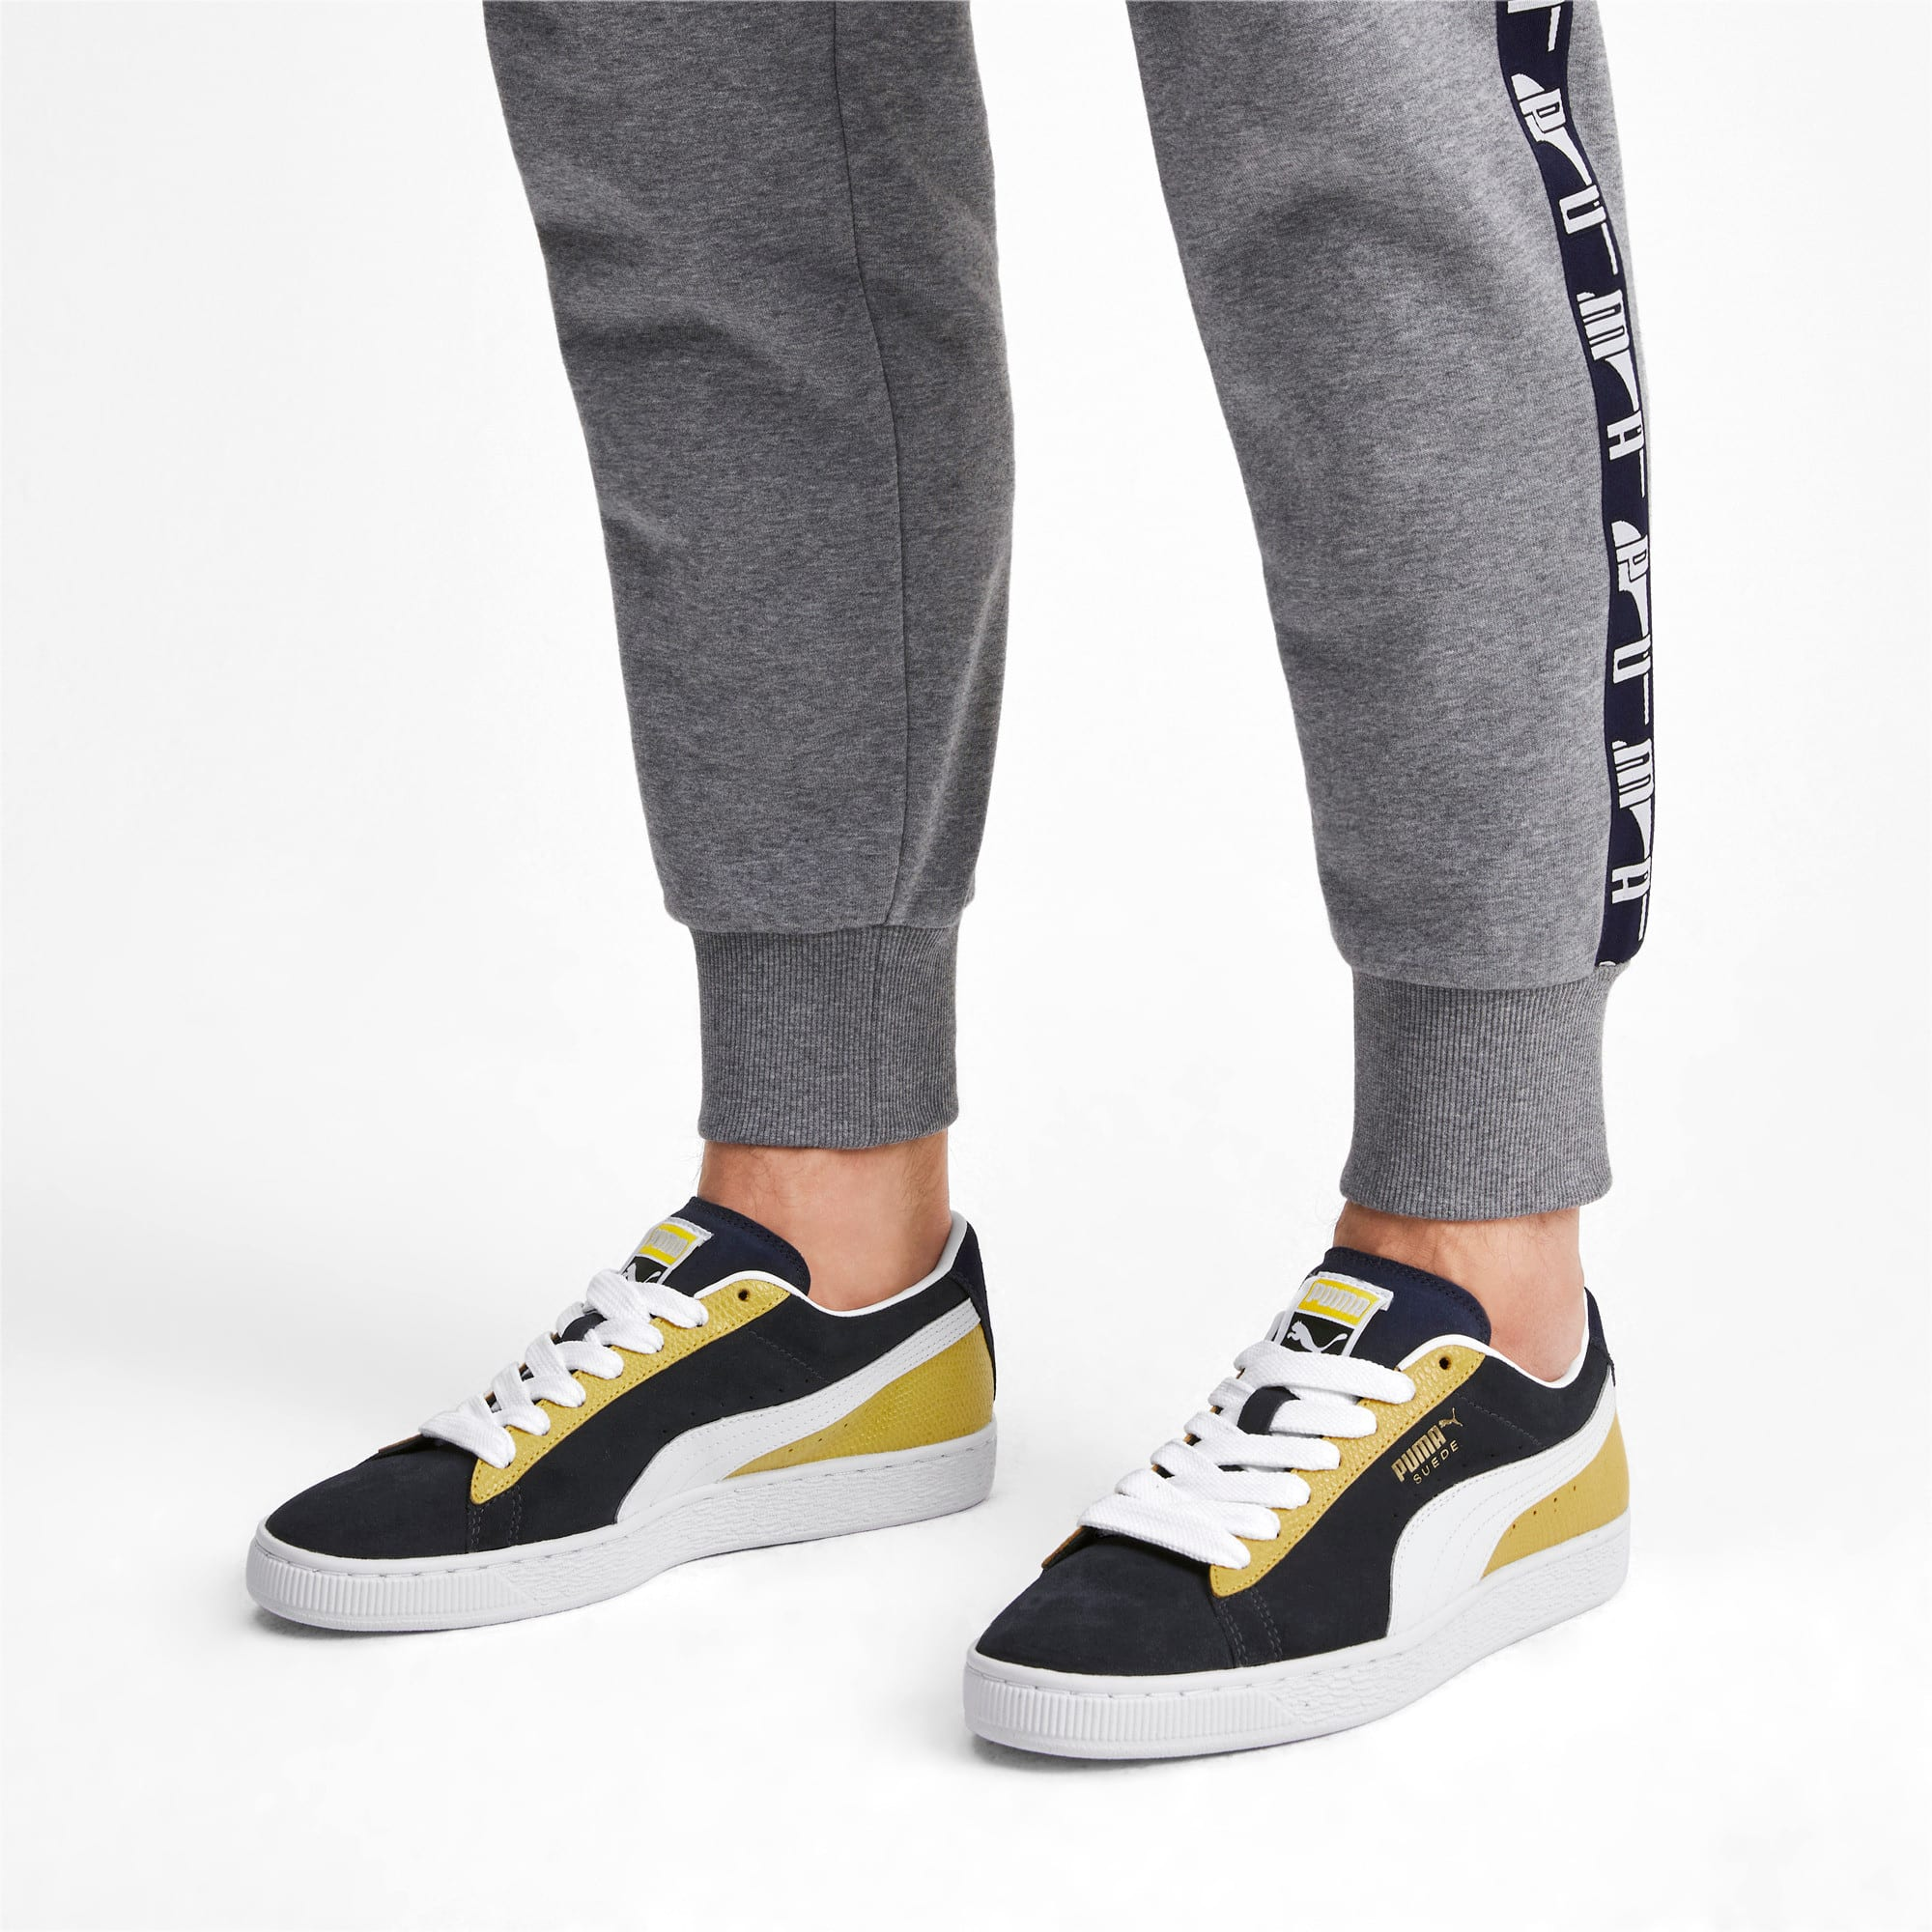 Miniatura 3 de Zapatos deportivos Suede Classic Block, Peacoat-Sulphur-Puma White, mediano